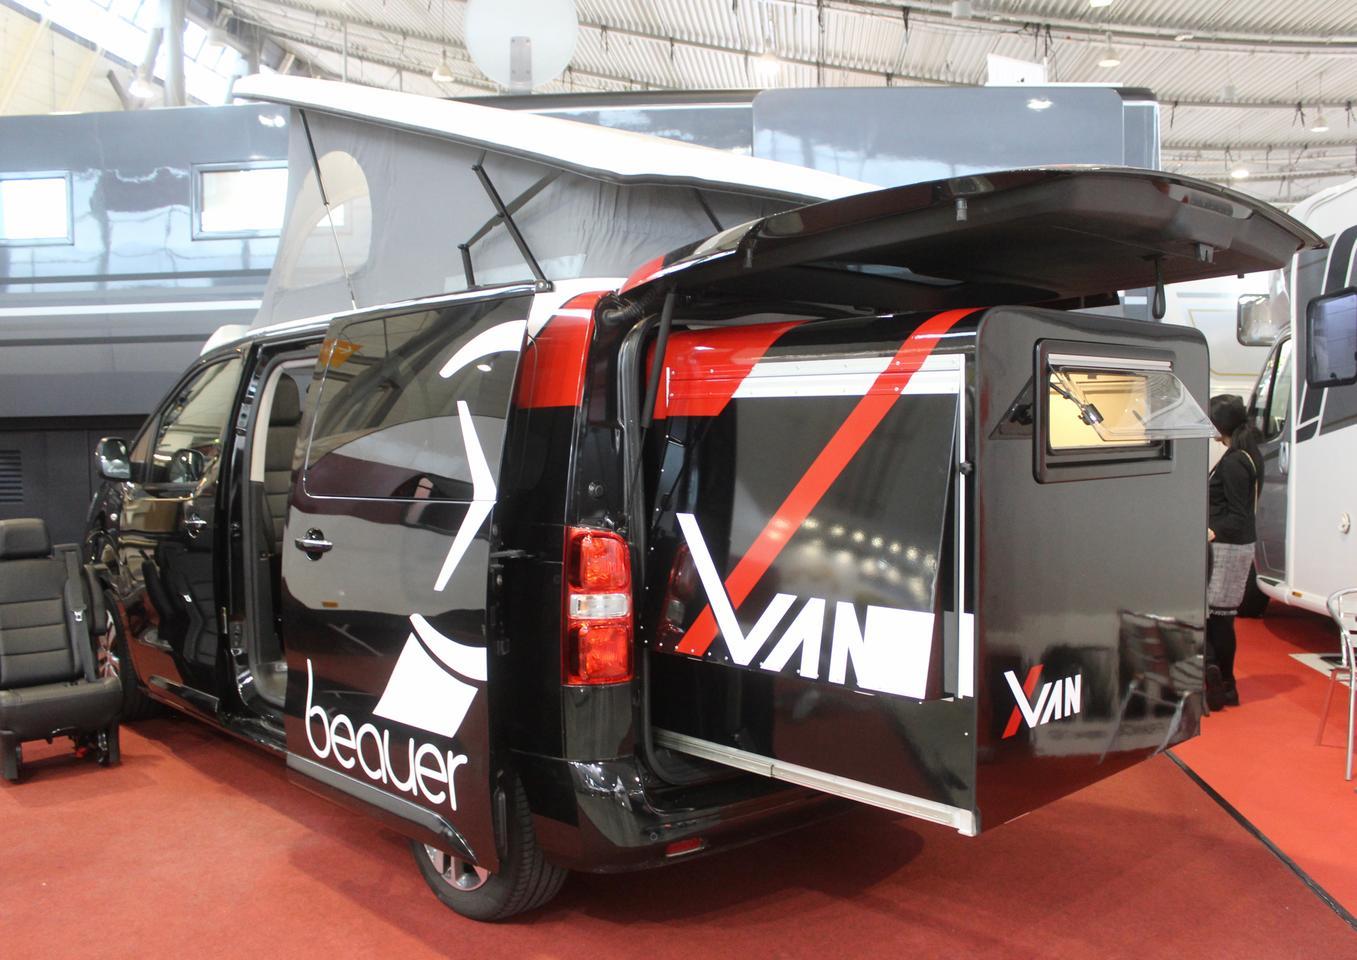 Beauer의 X-Van은 소형 밴용 전동 확장 슬리퍼 모듈입니다.